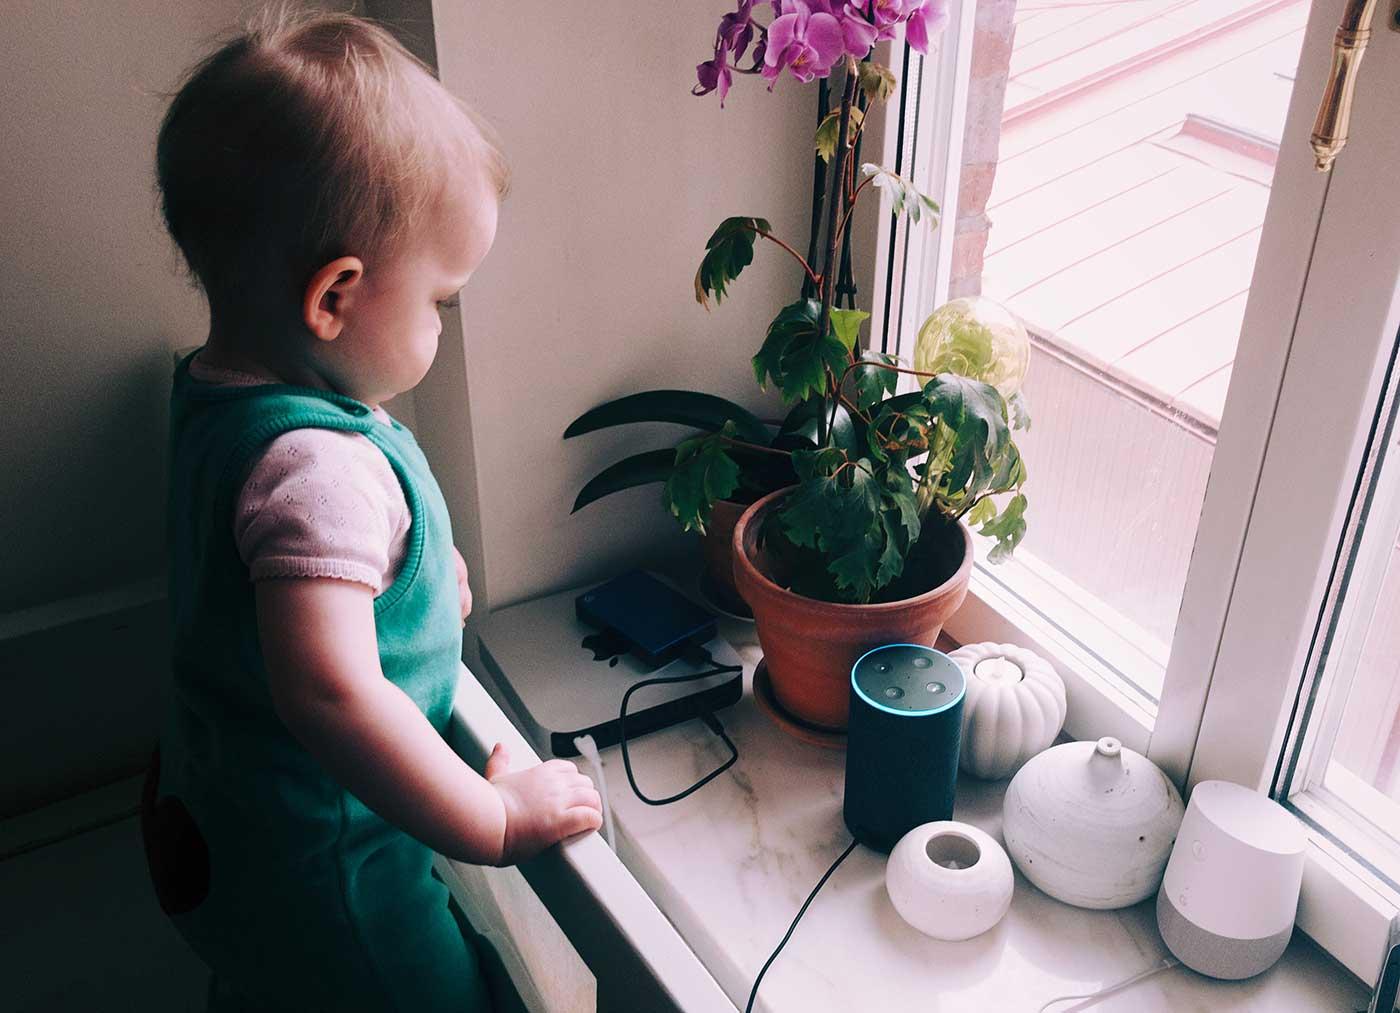 Barn bredvid Amazon Echo (Alexa), Google Home och en Apple Mac Mini